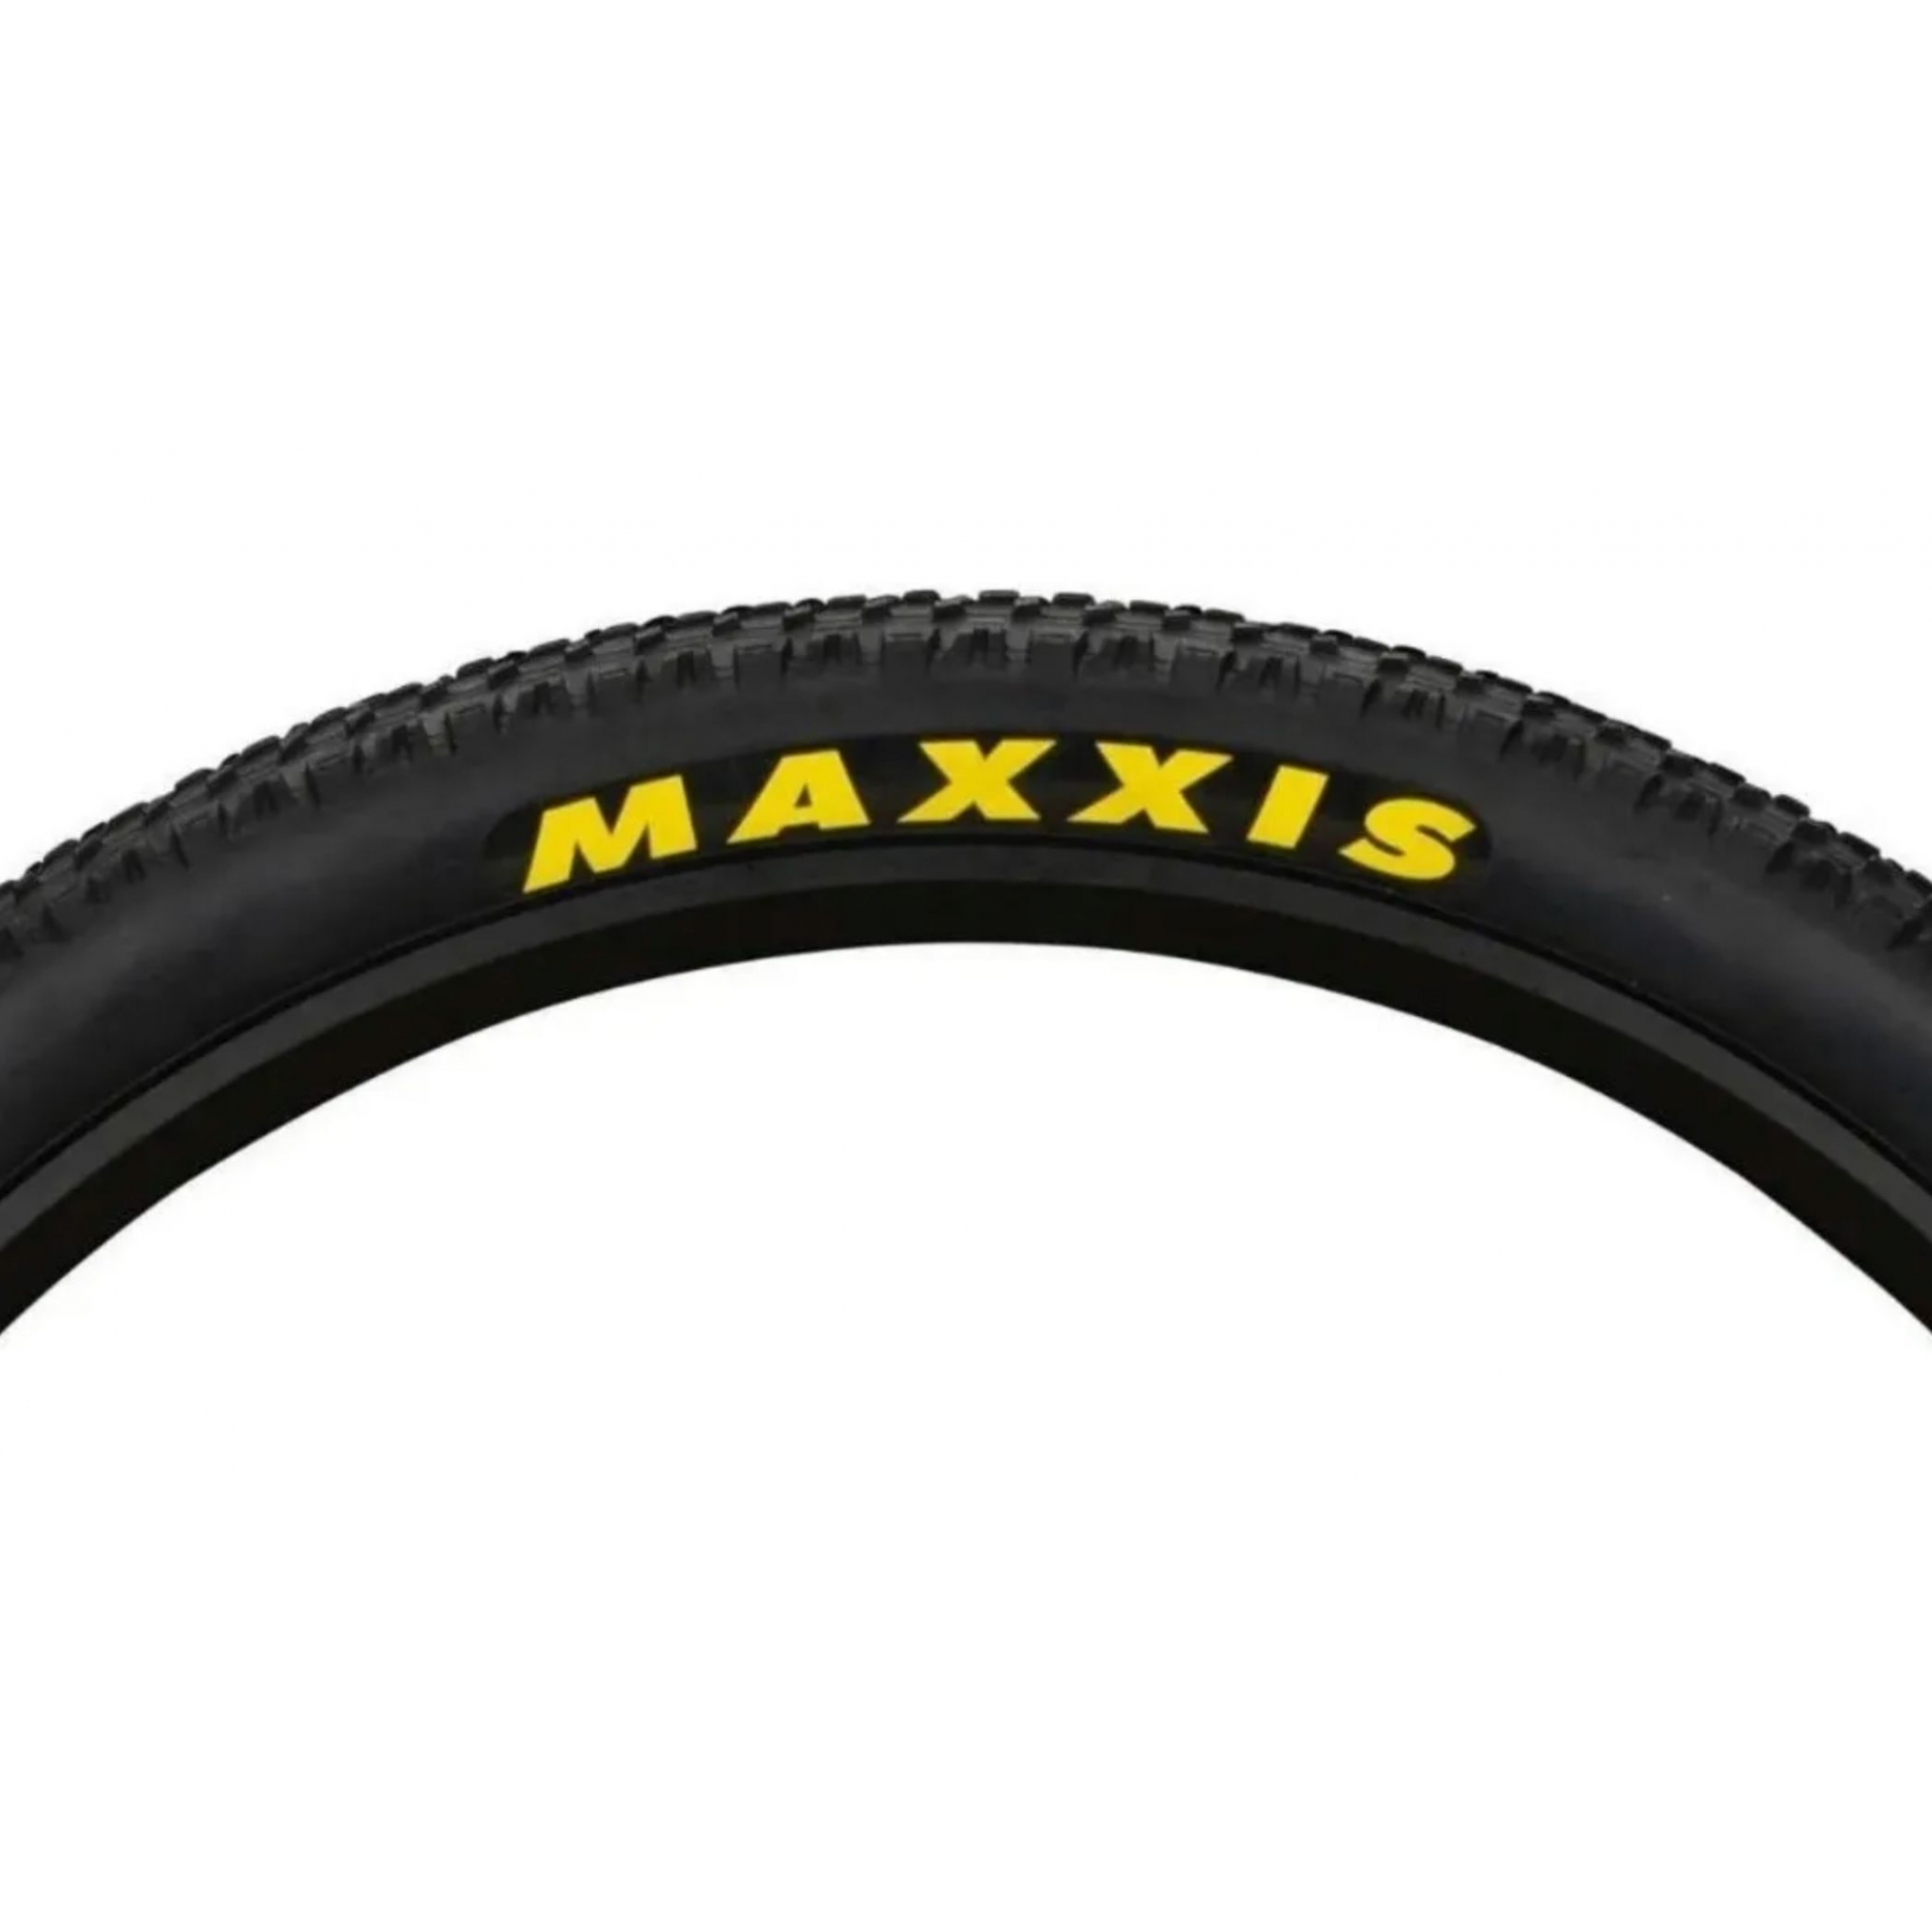 Par Pneus Maxxis Ardent Race 29x2.20 Exo Tubeless